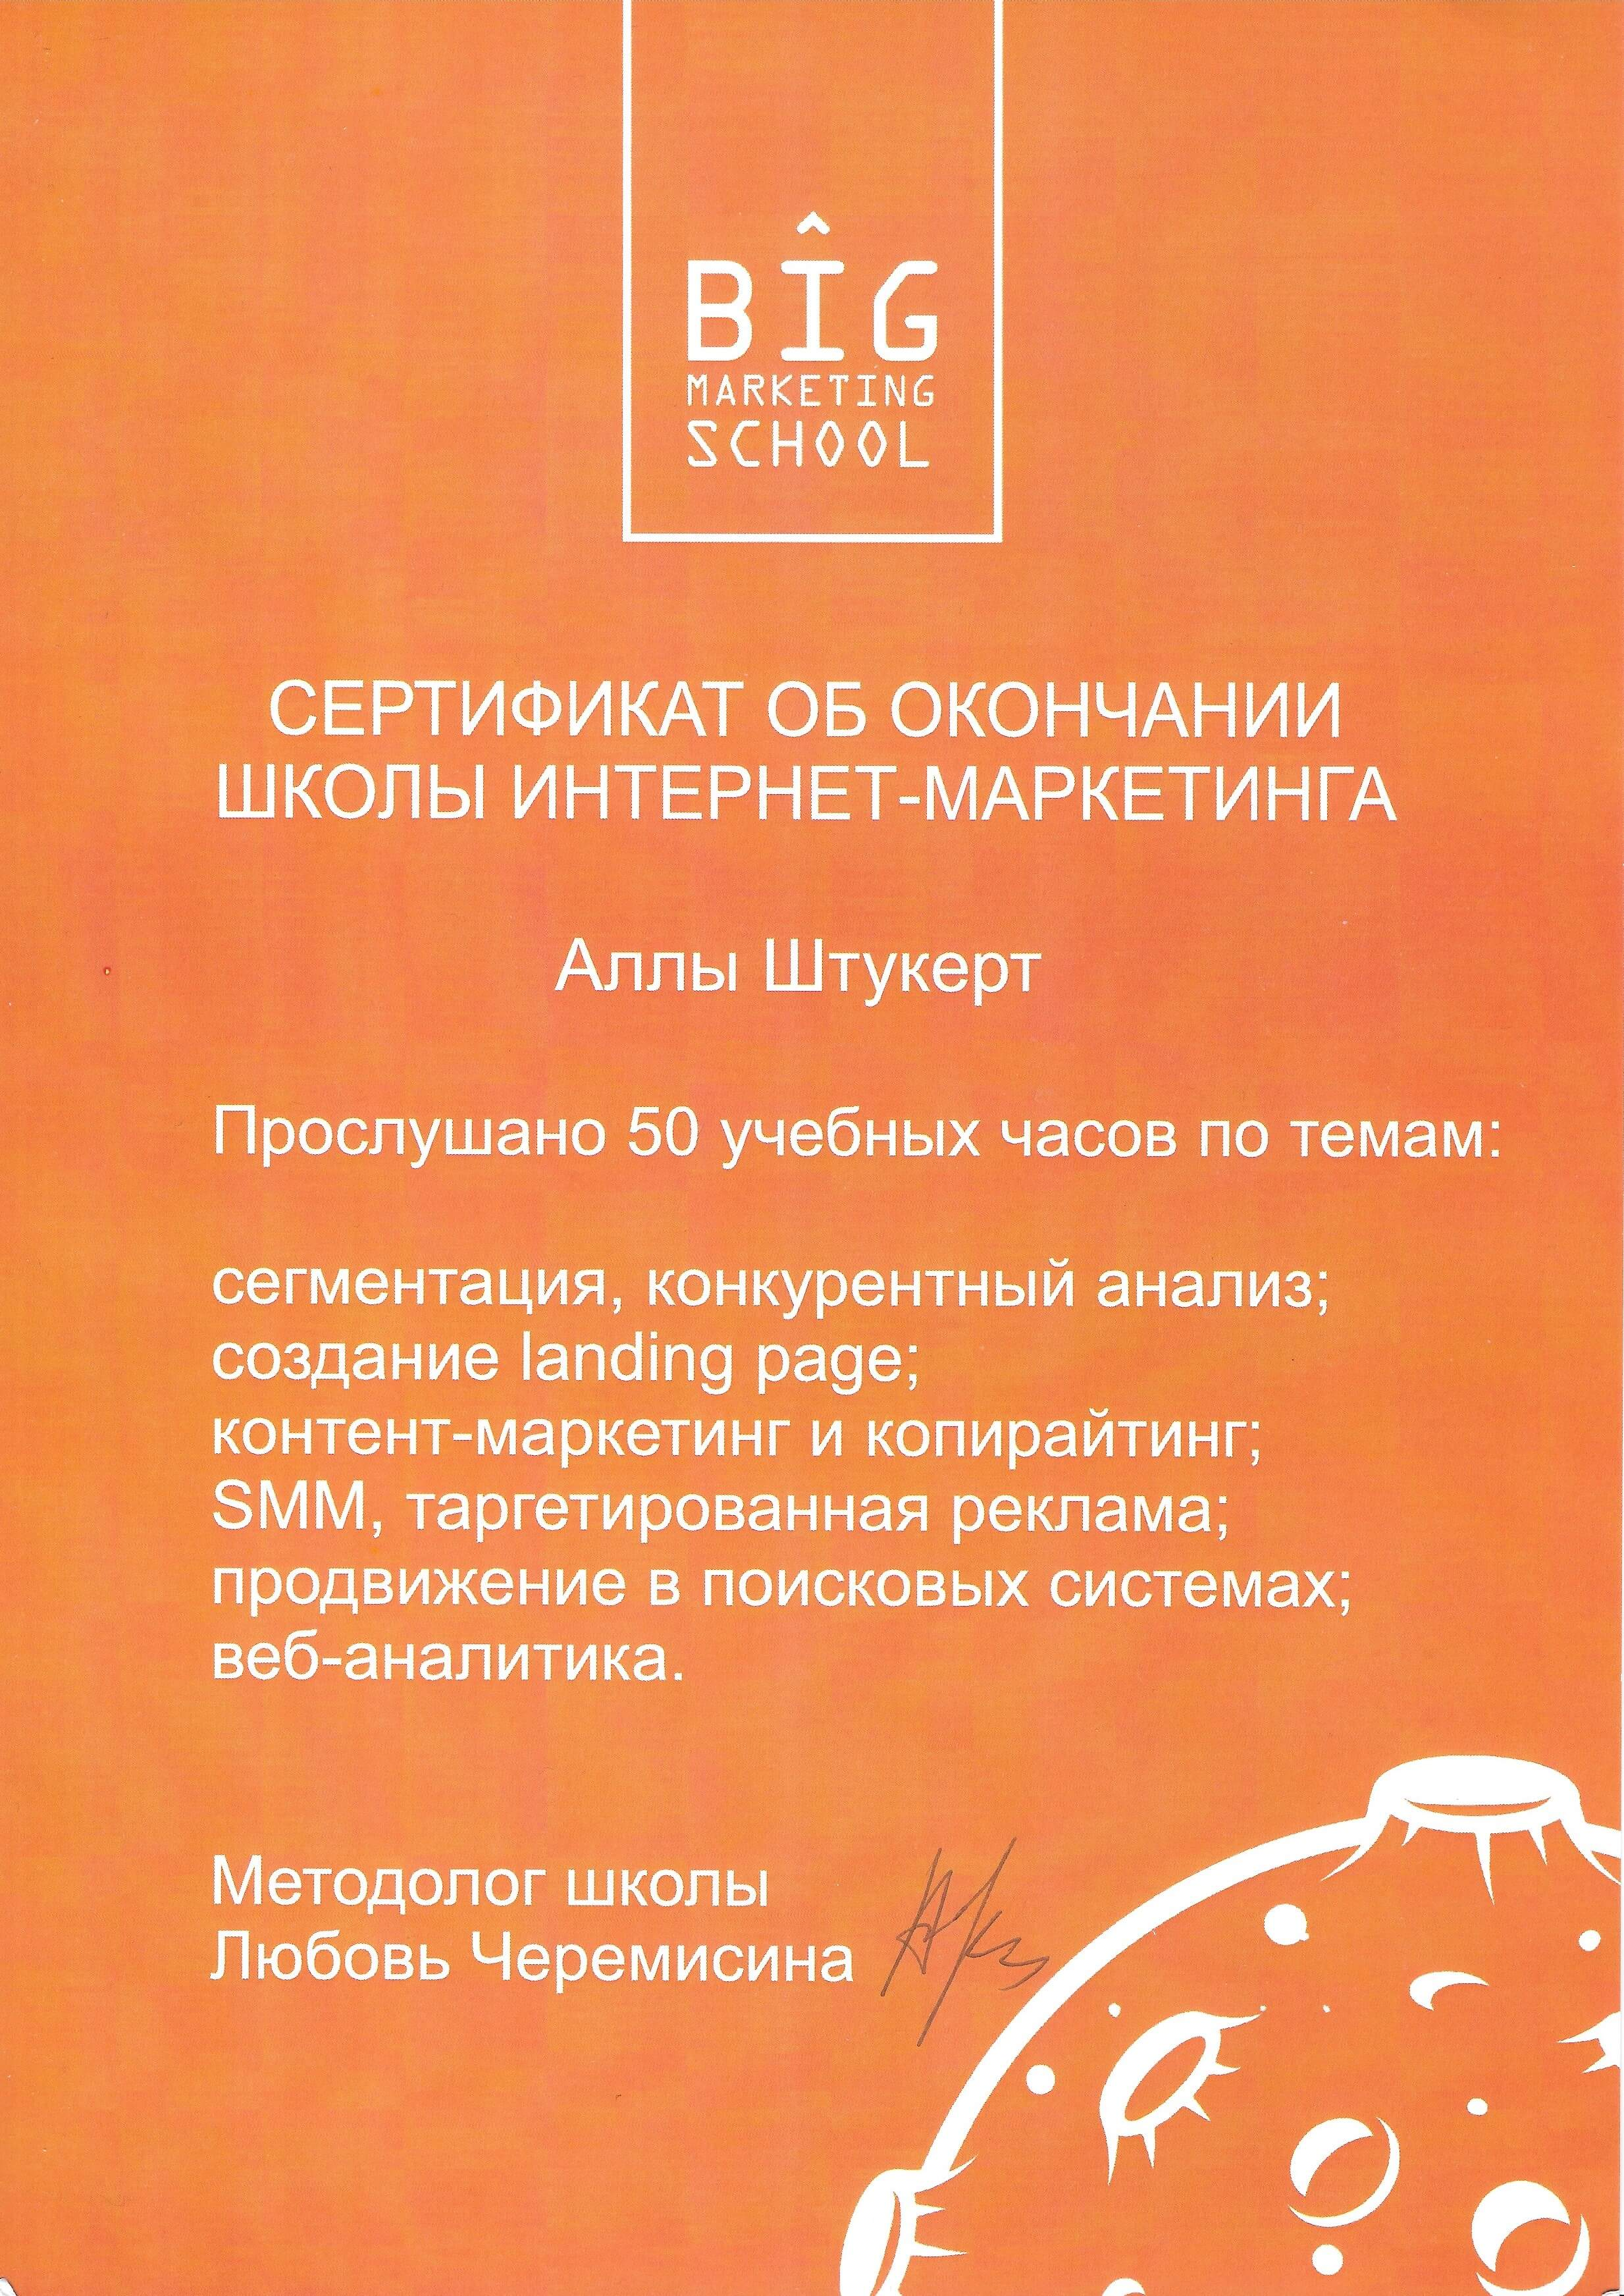 сертификат об окончании школы интернет-маркетинга